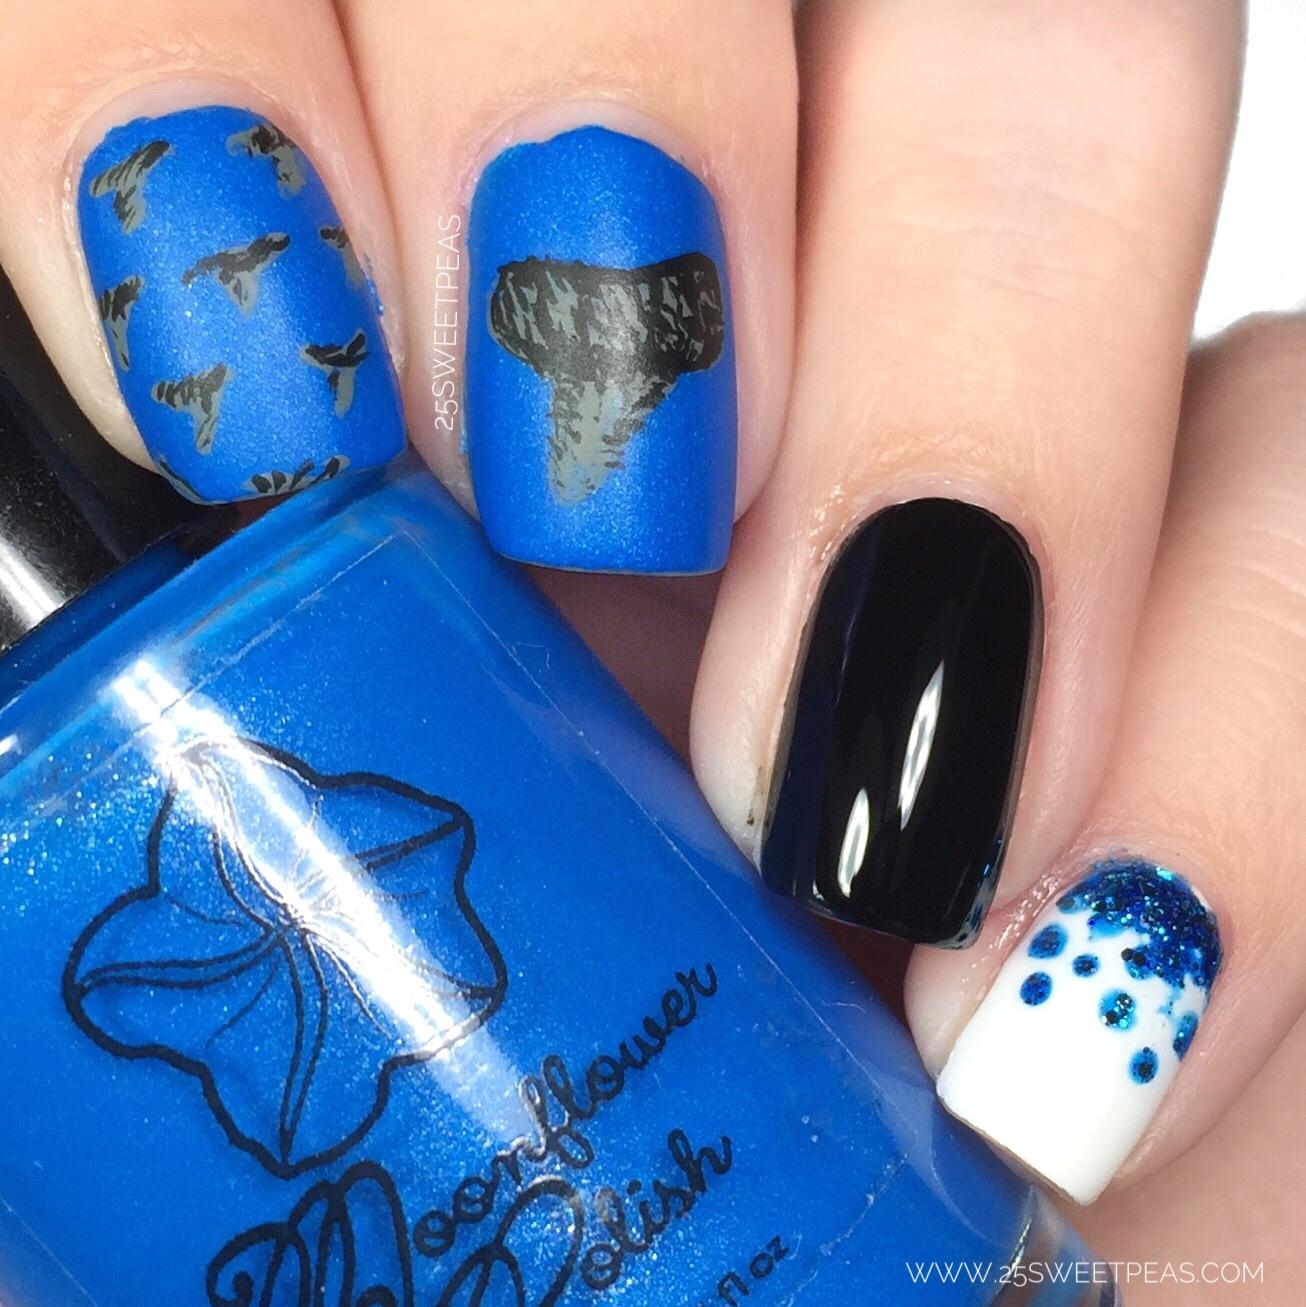 Shark Week Nail Art - 25 Sweetpeas